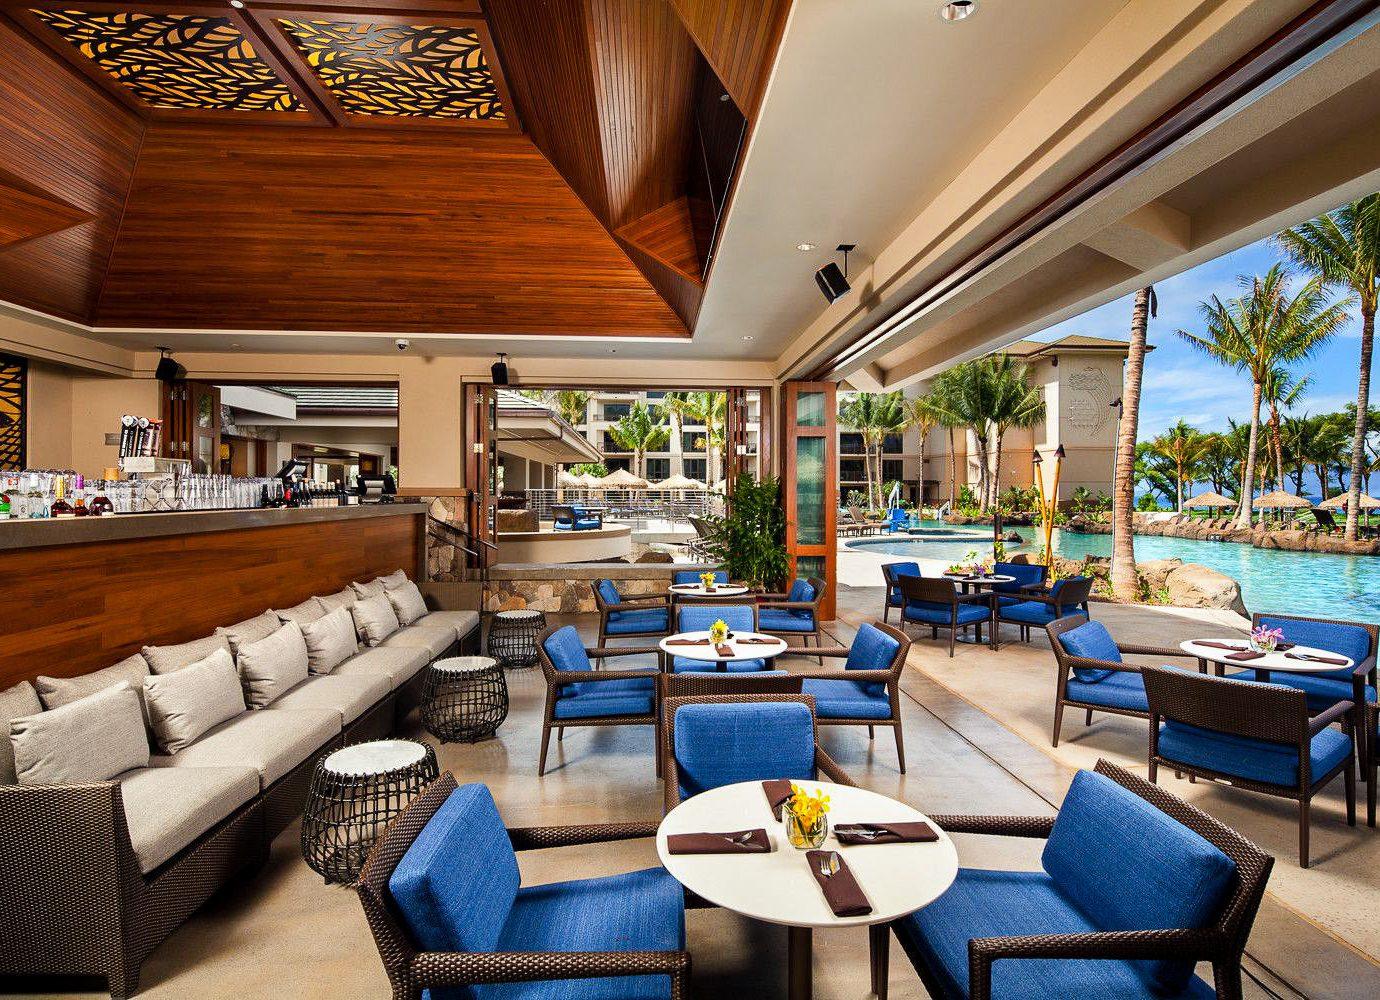 Spring Trips Trip Ideas Resort interior design restaurant leisure real estate estate Lobby vacation